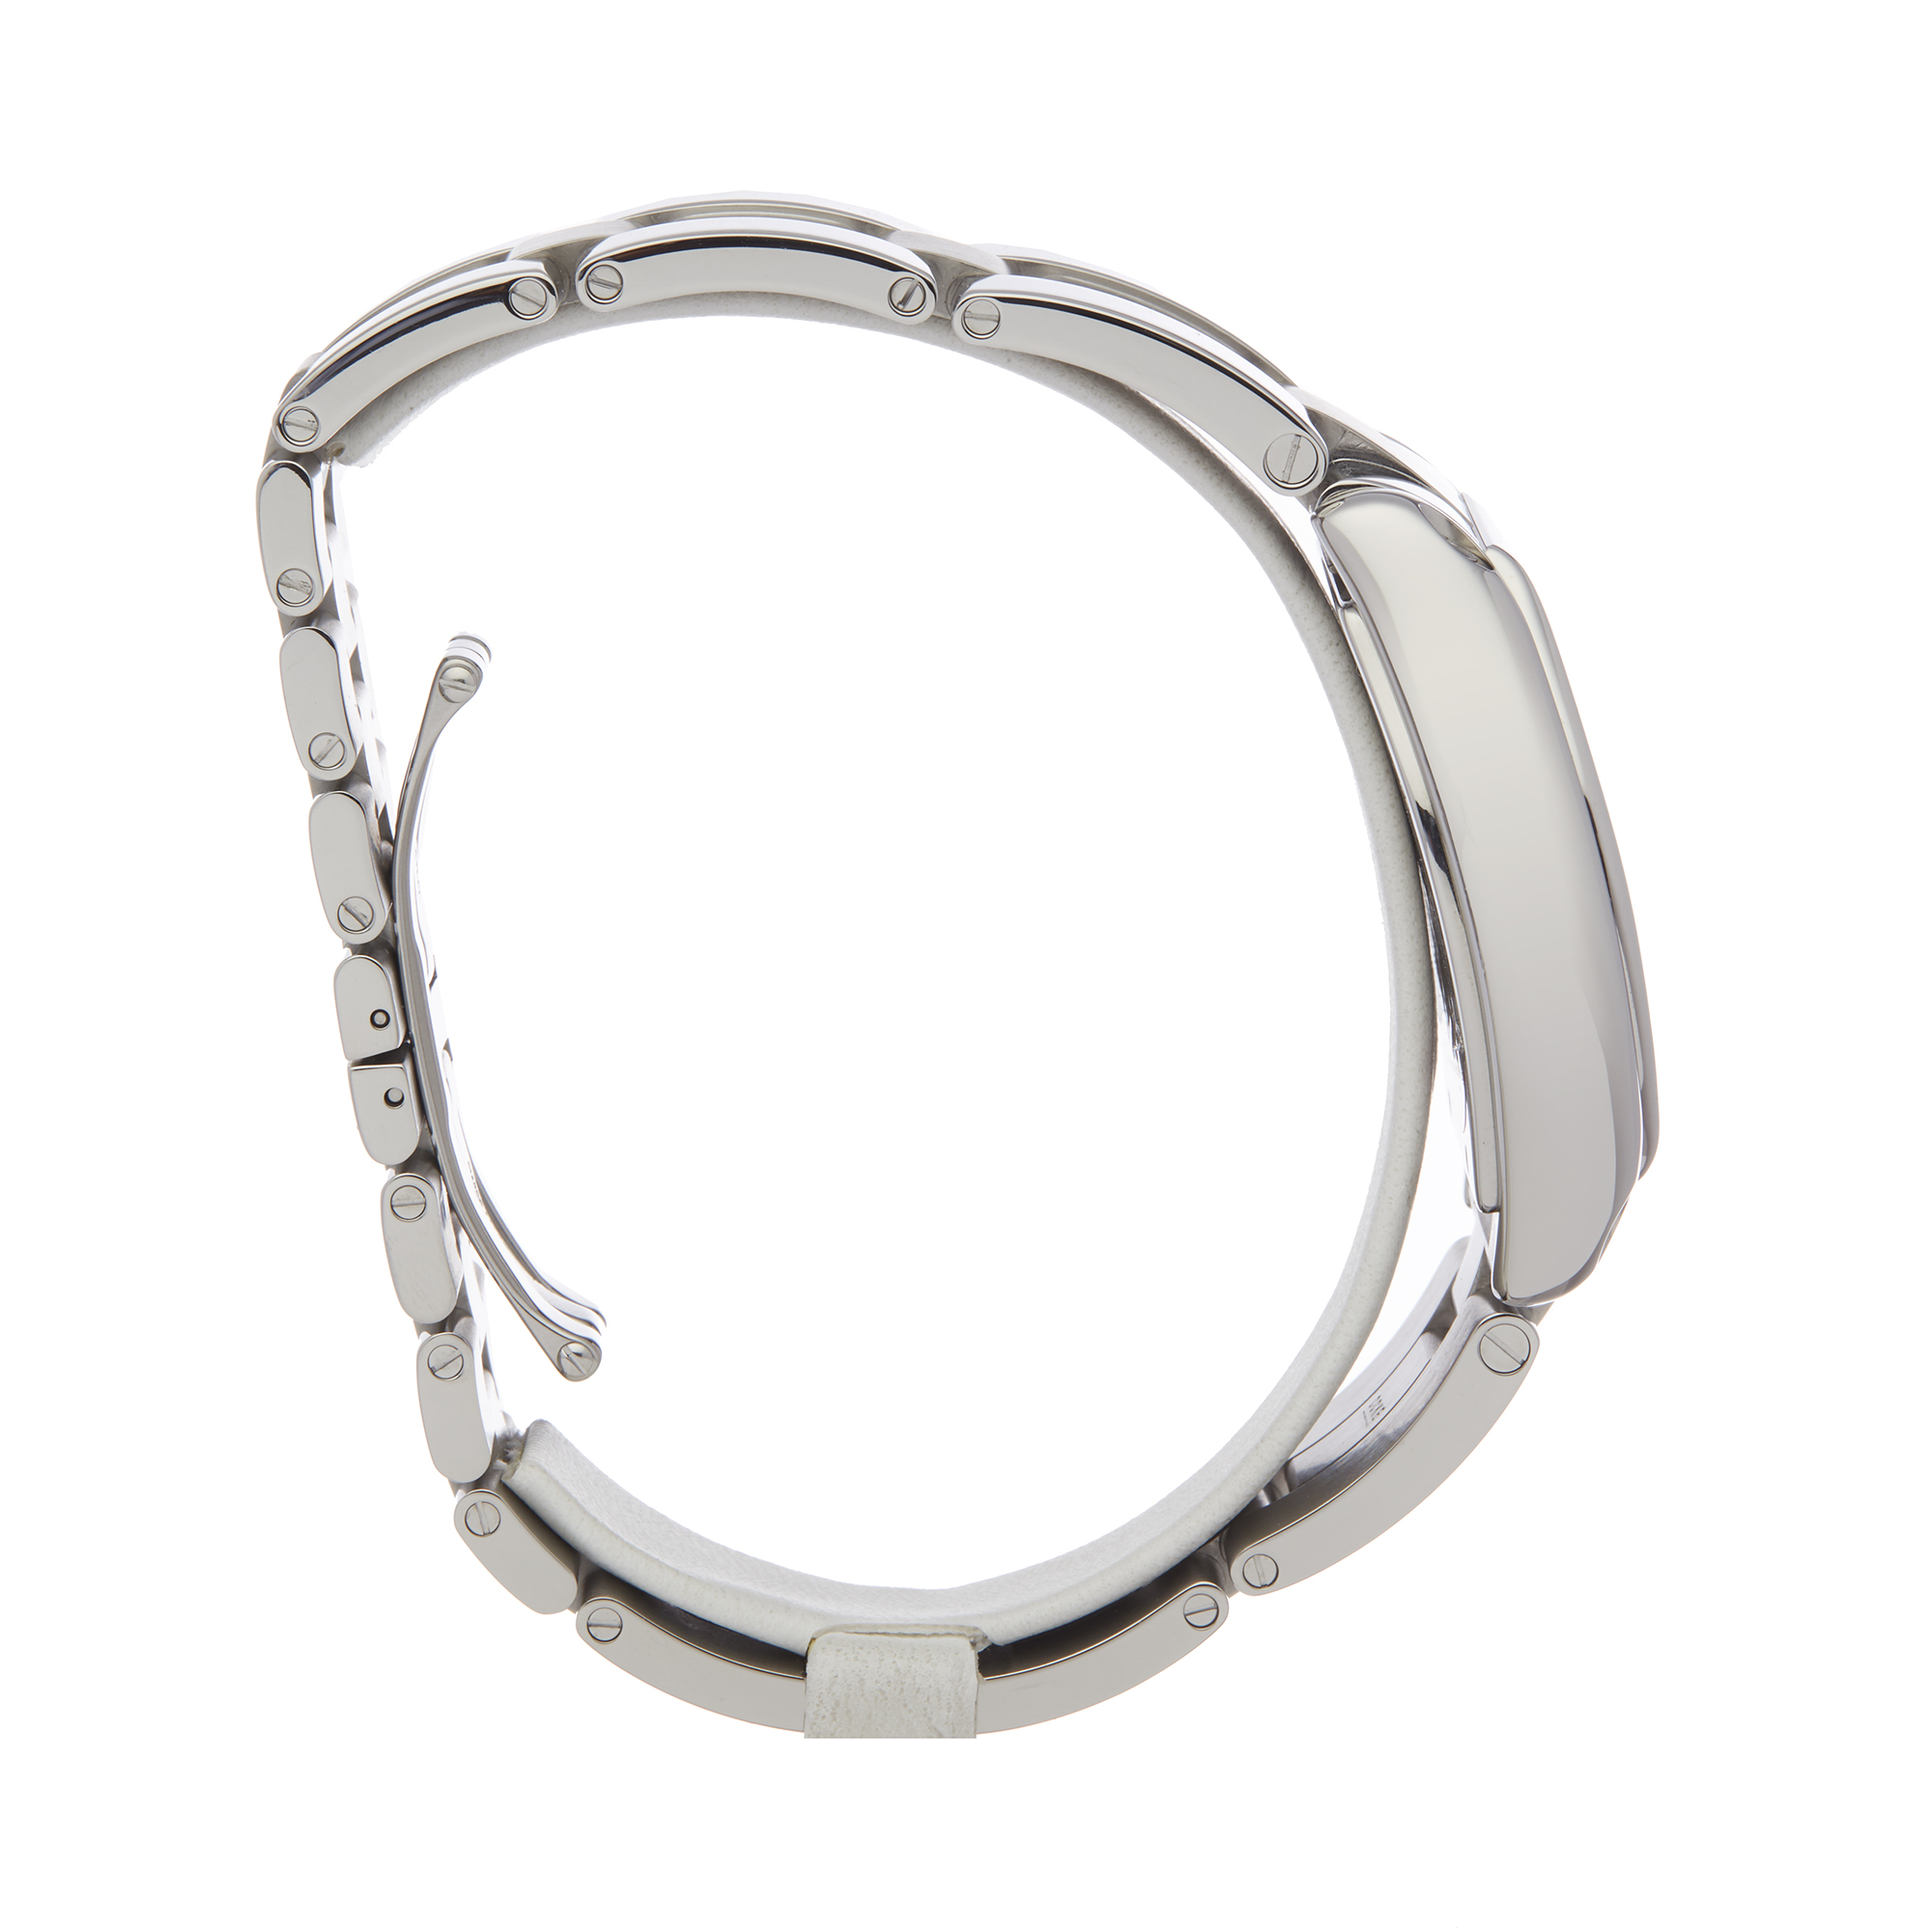 Cartier Roadster 2510 Men Stainless Steel Watch - Image 6 of 8